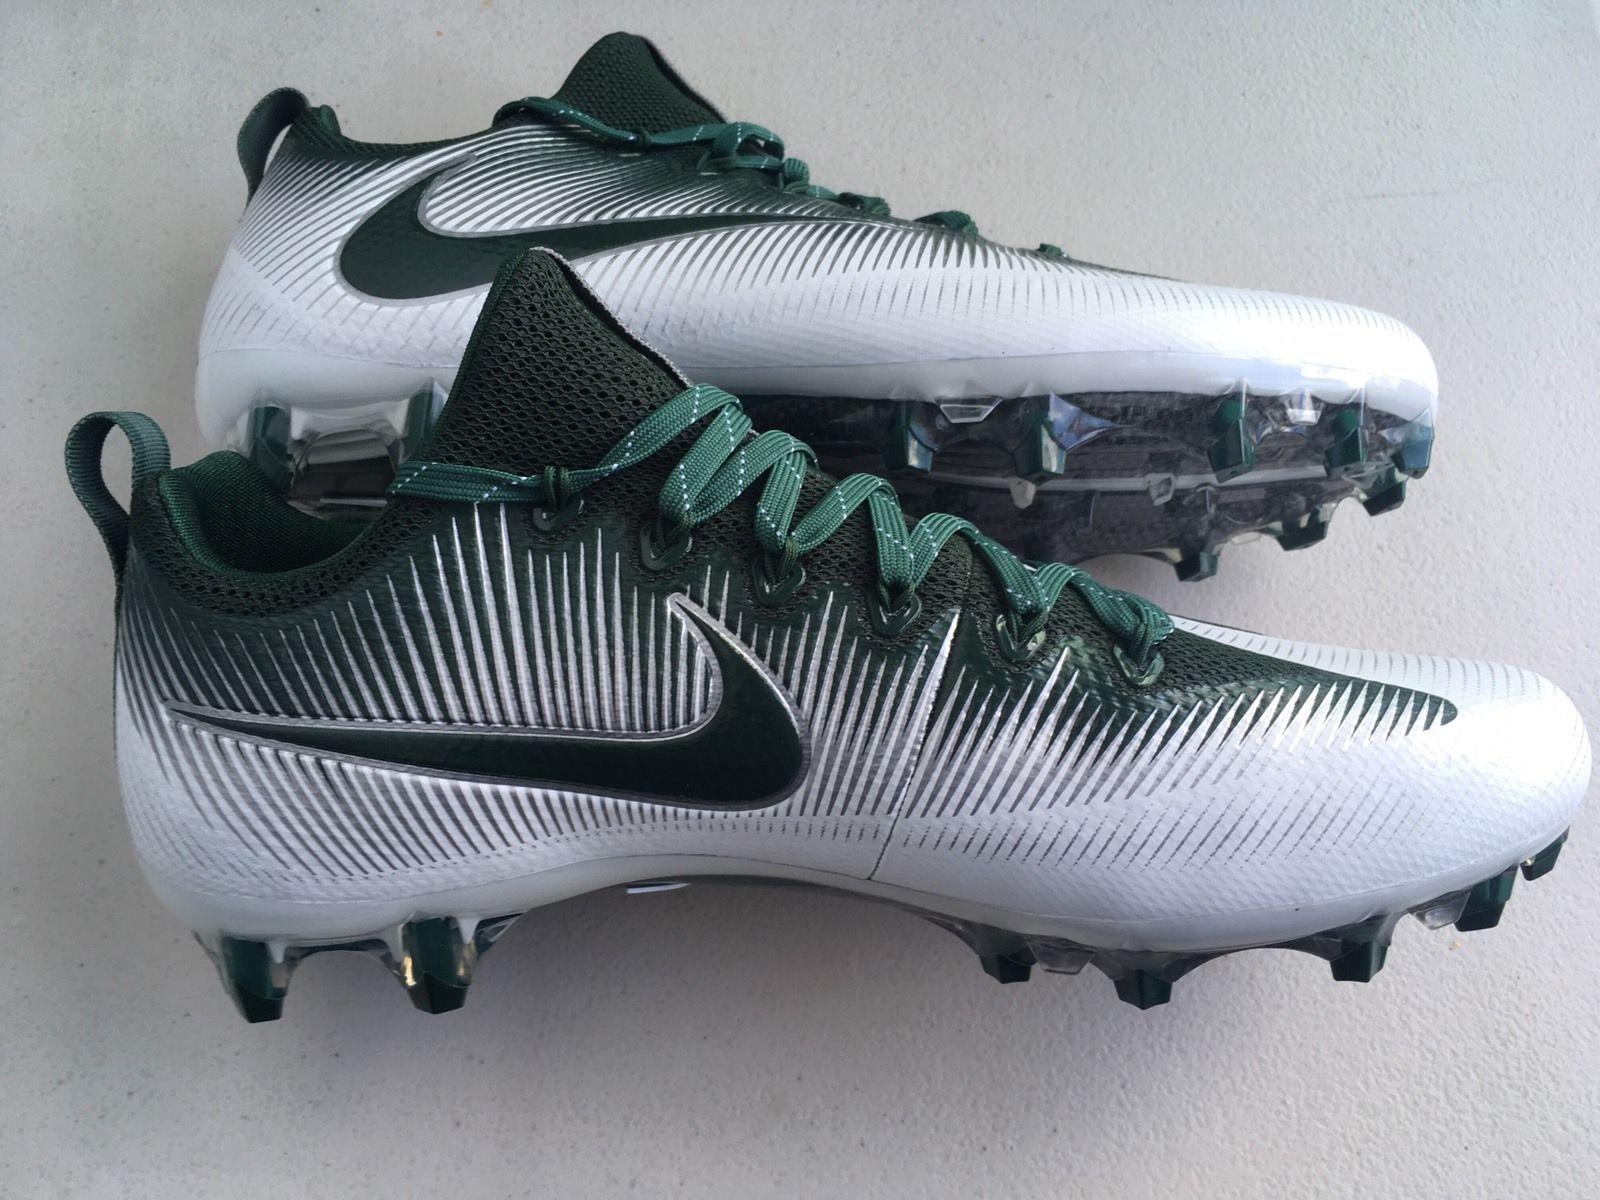 Nike Vapor Untouchable Pro 2 Football Cleats Mens Size 10